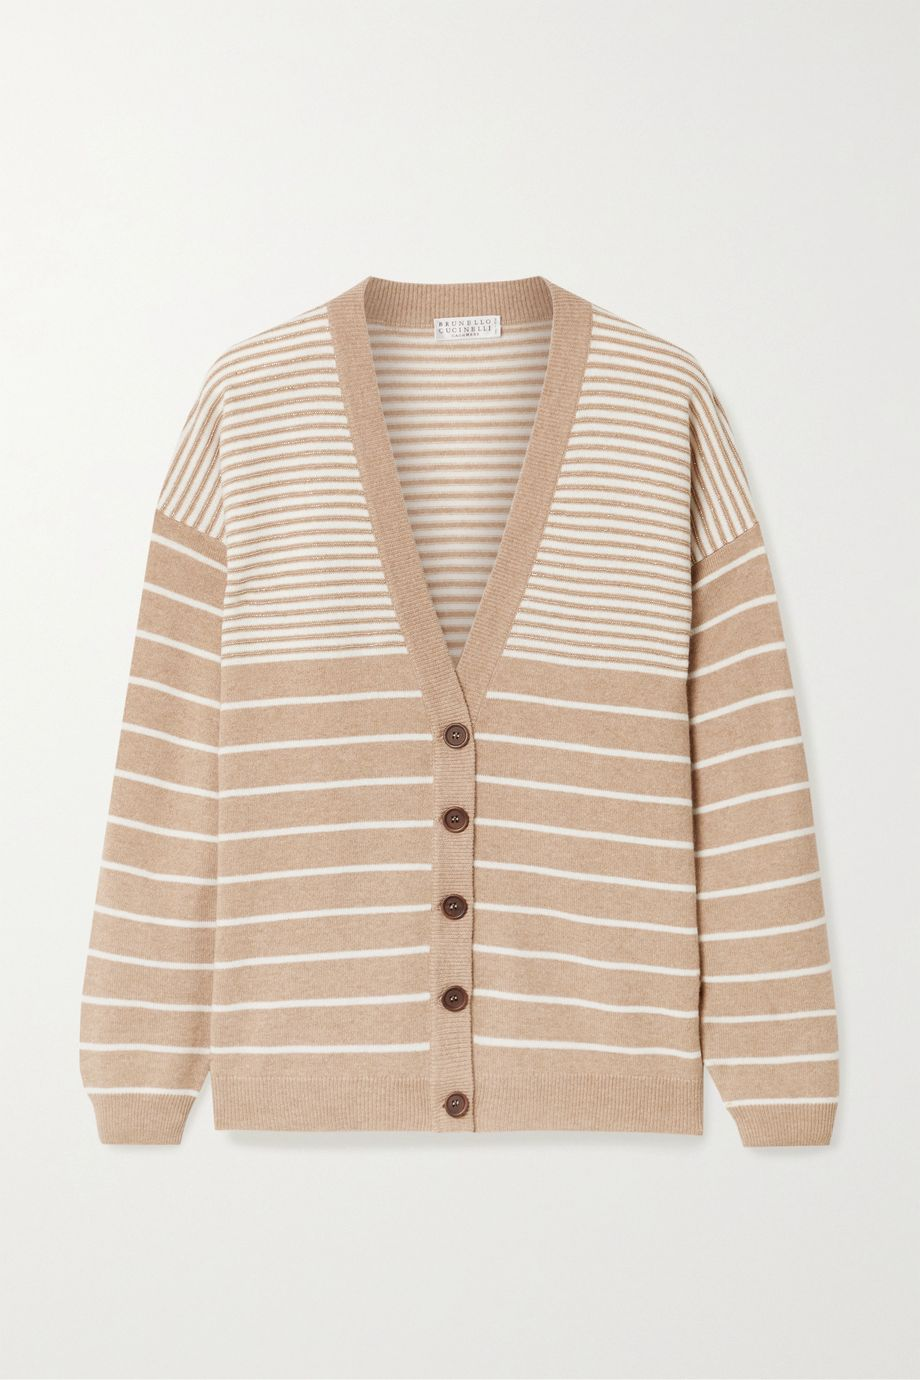 Brunello Cucinelli Bead-embellished striped wool-blend cardigan